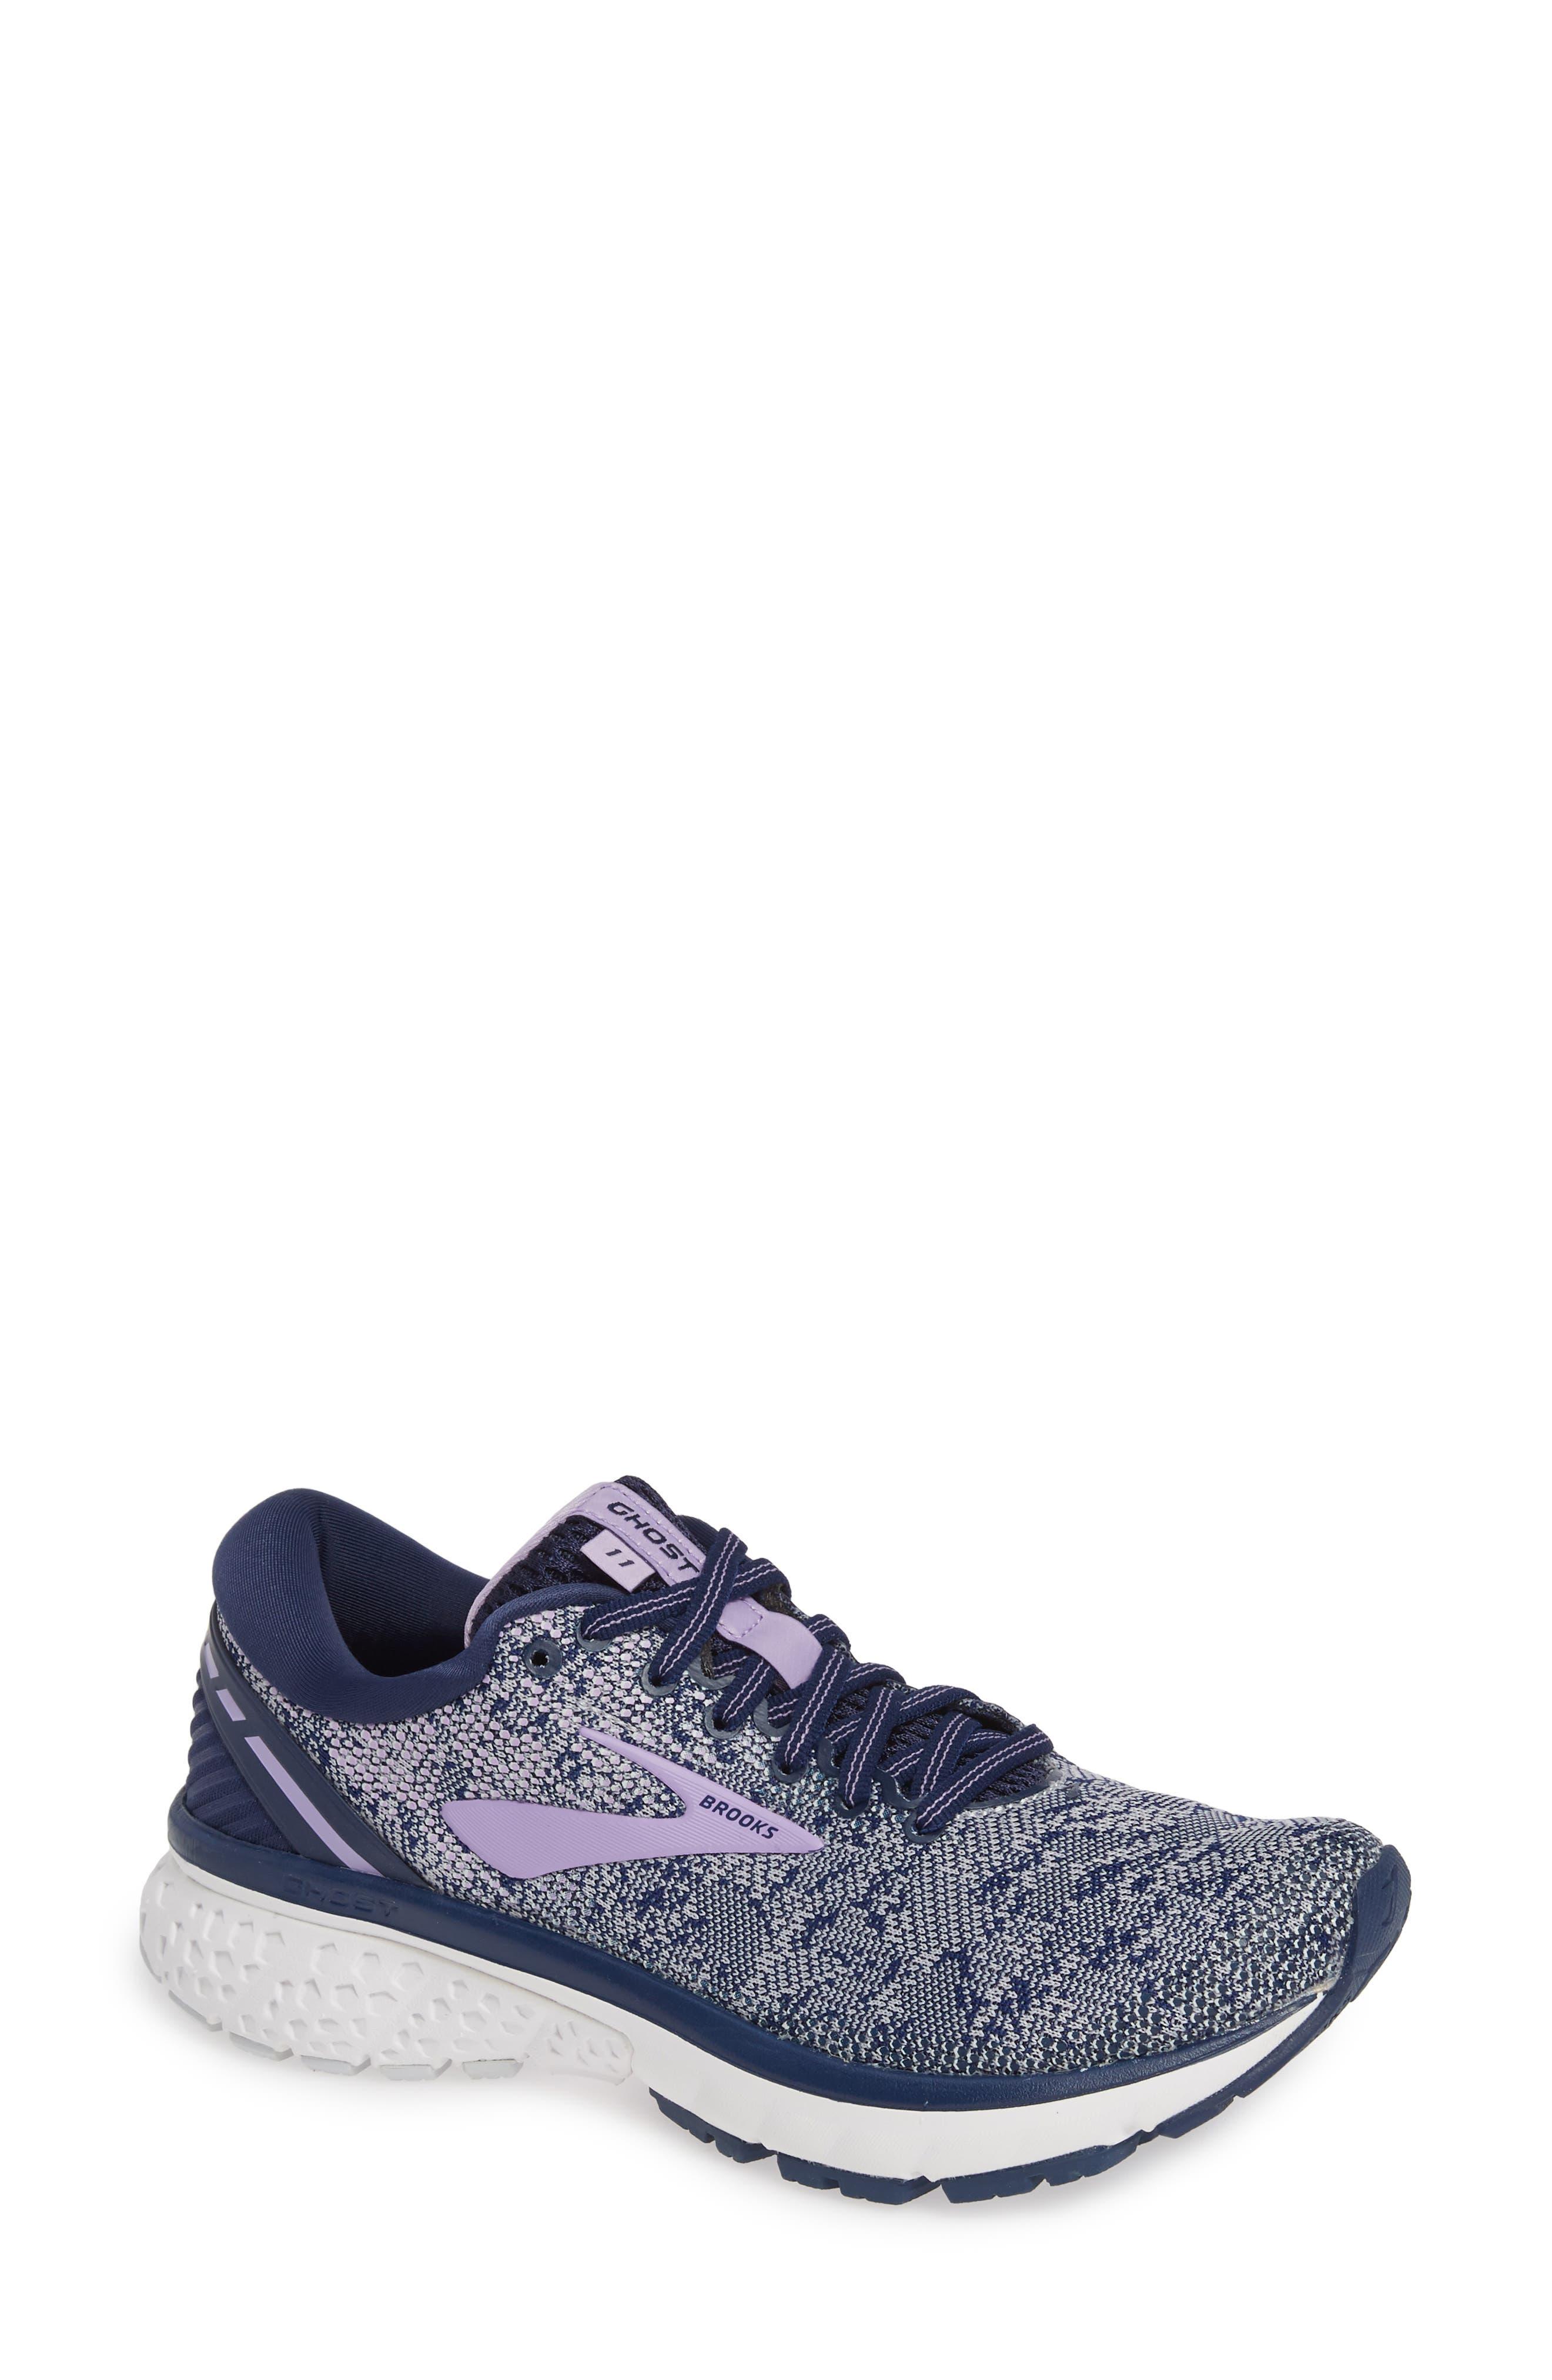 38e017de65f0d Grey Brooks Shoes